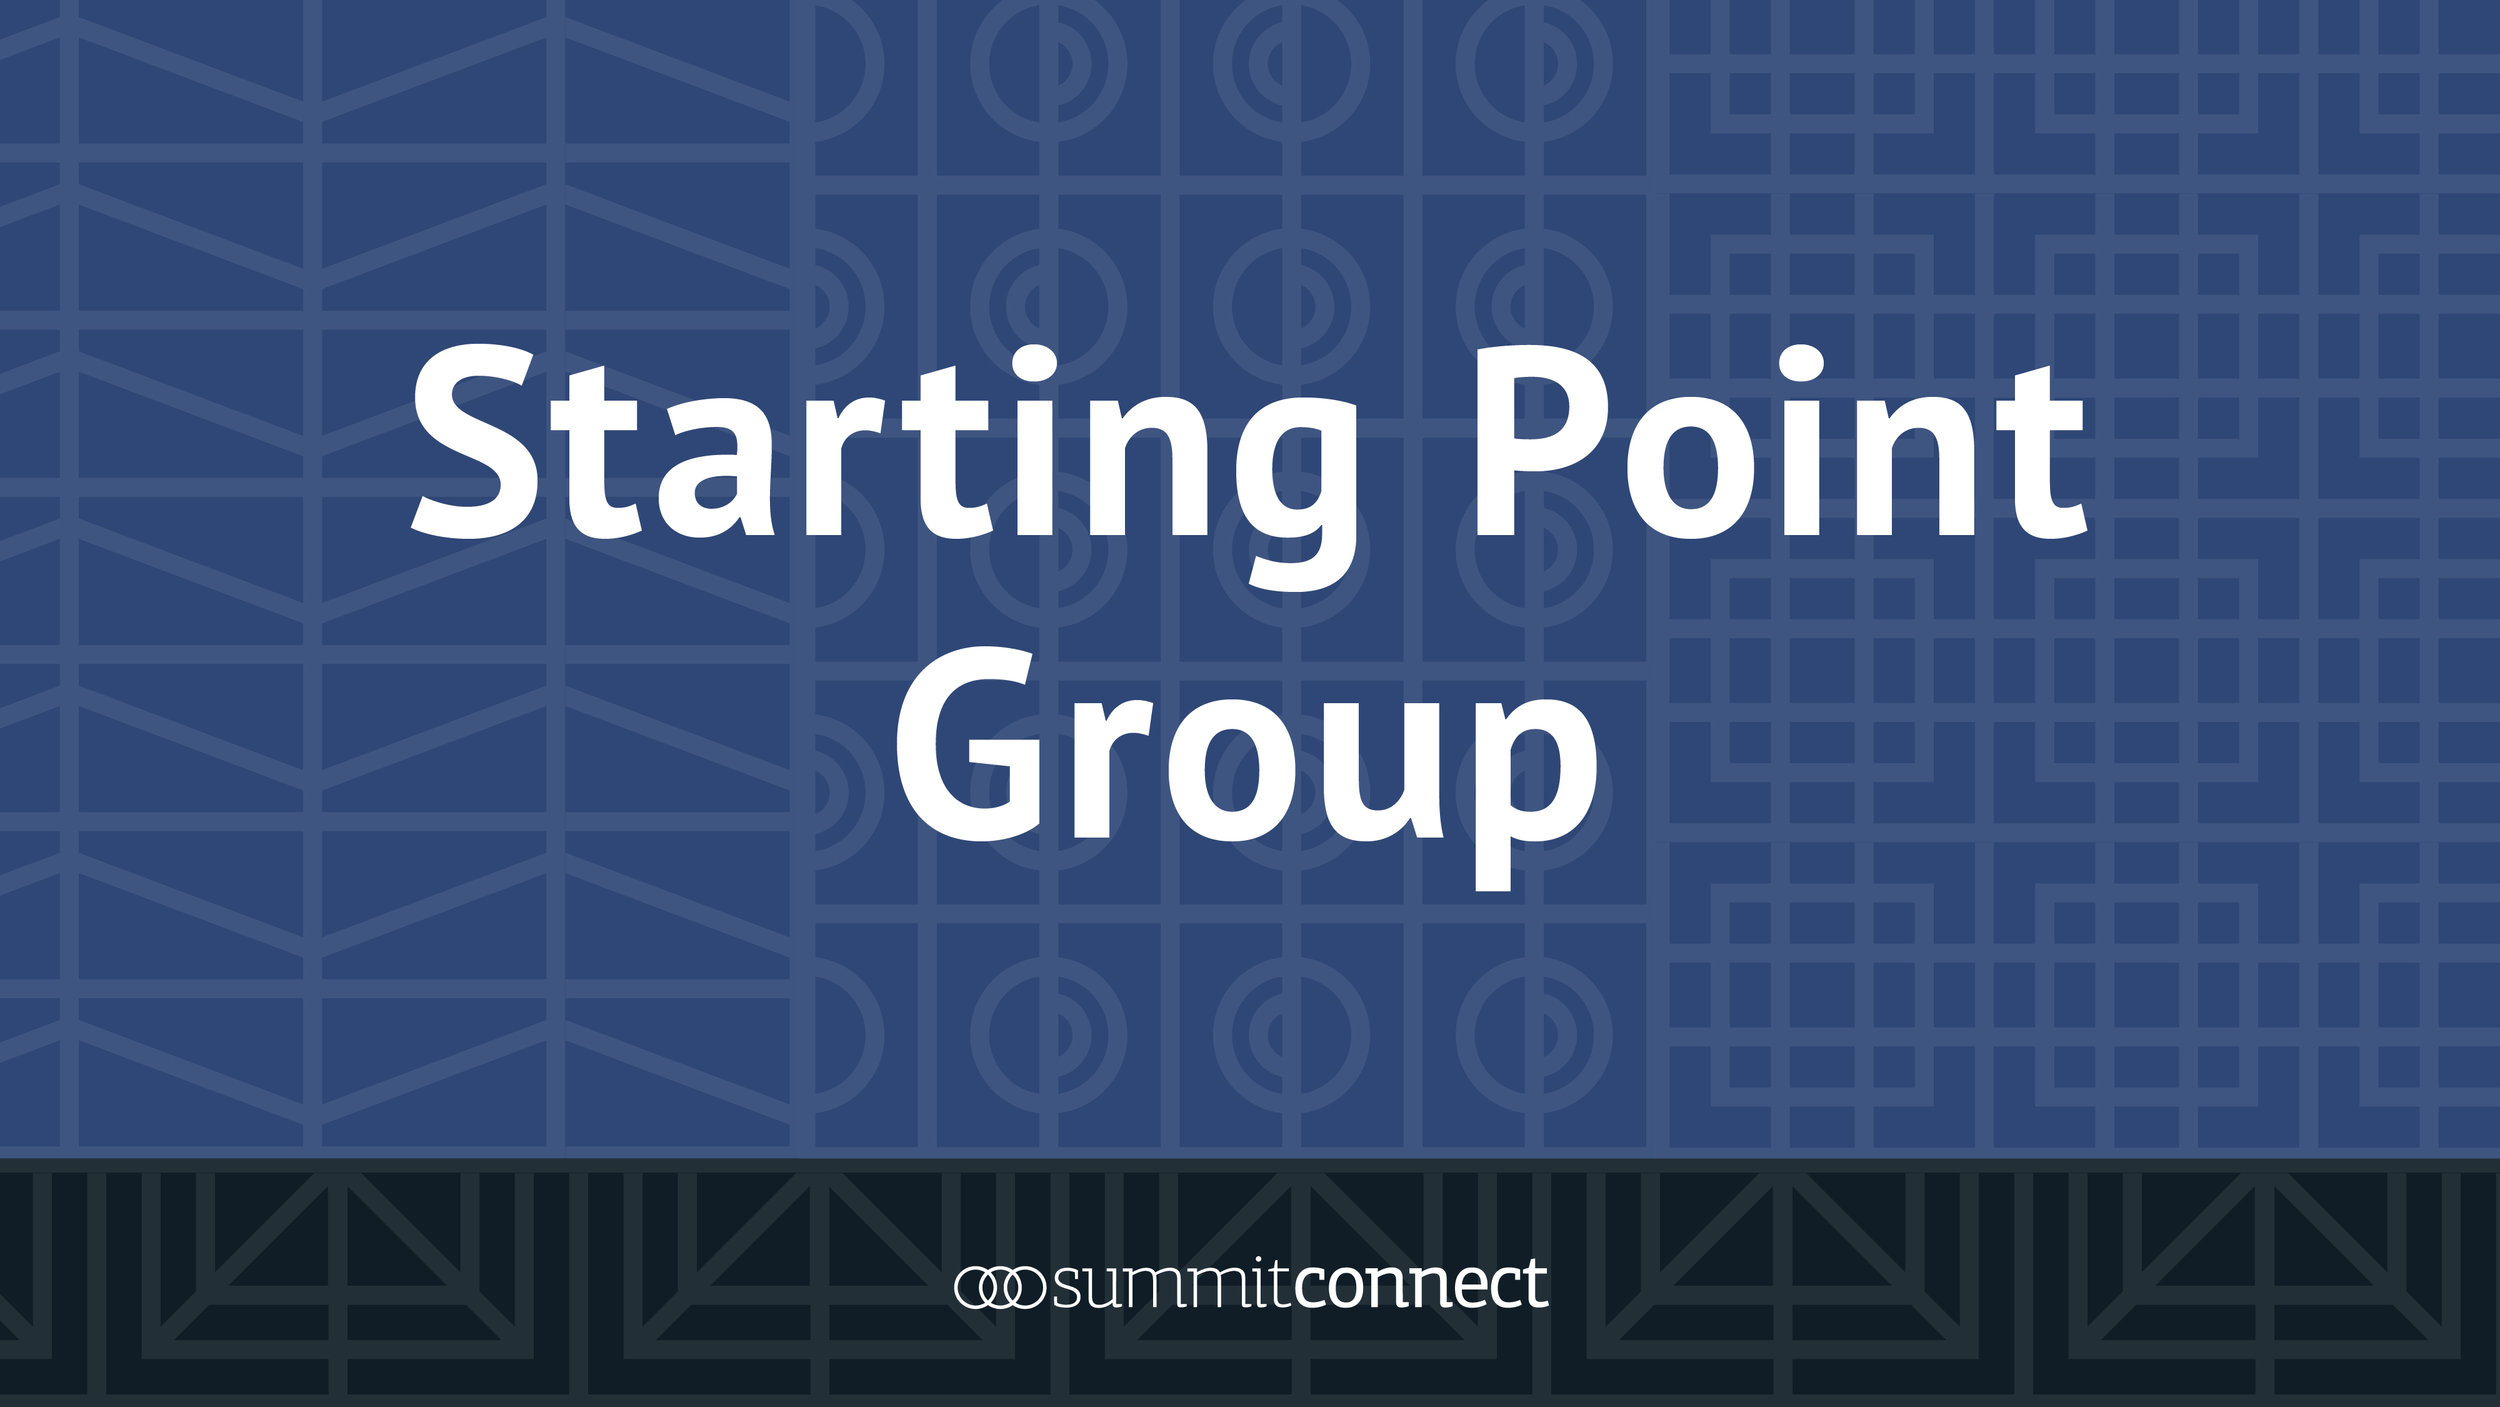 StartingPointGroups_April2018_fullscreens_web.jpg